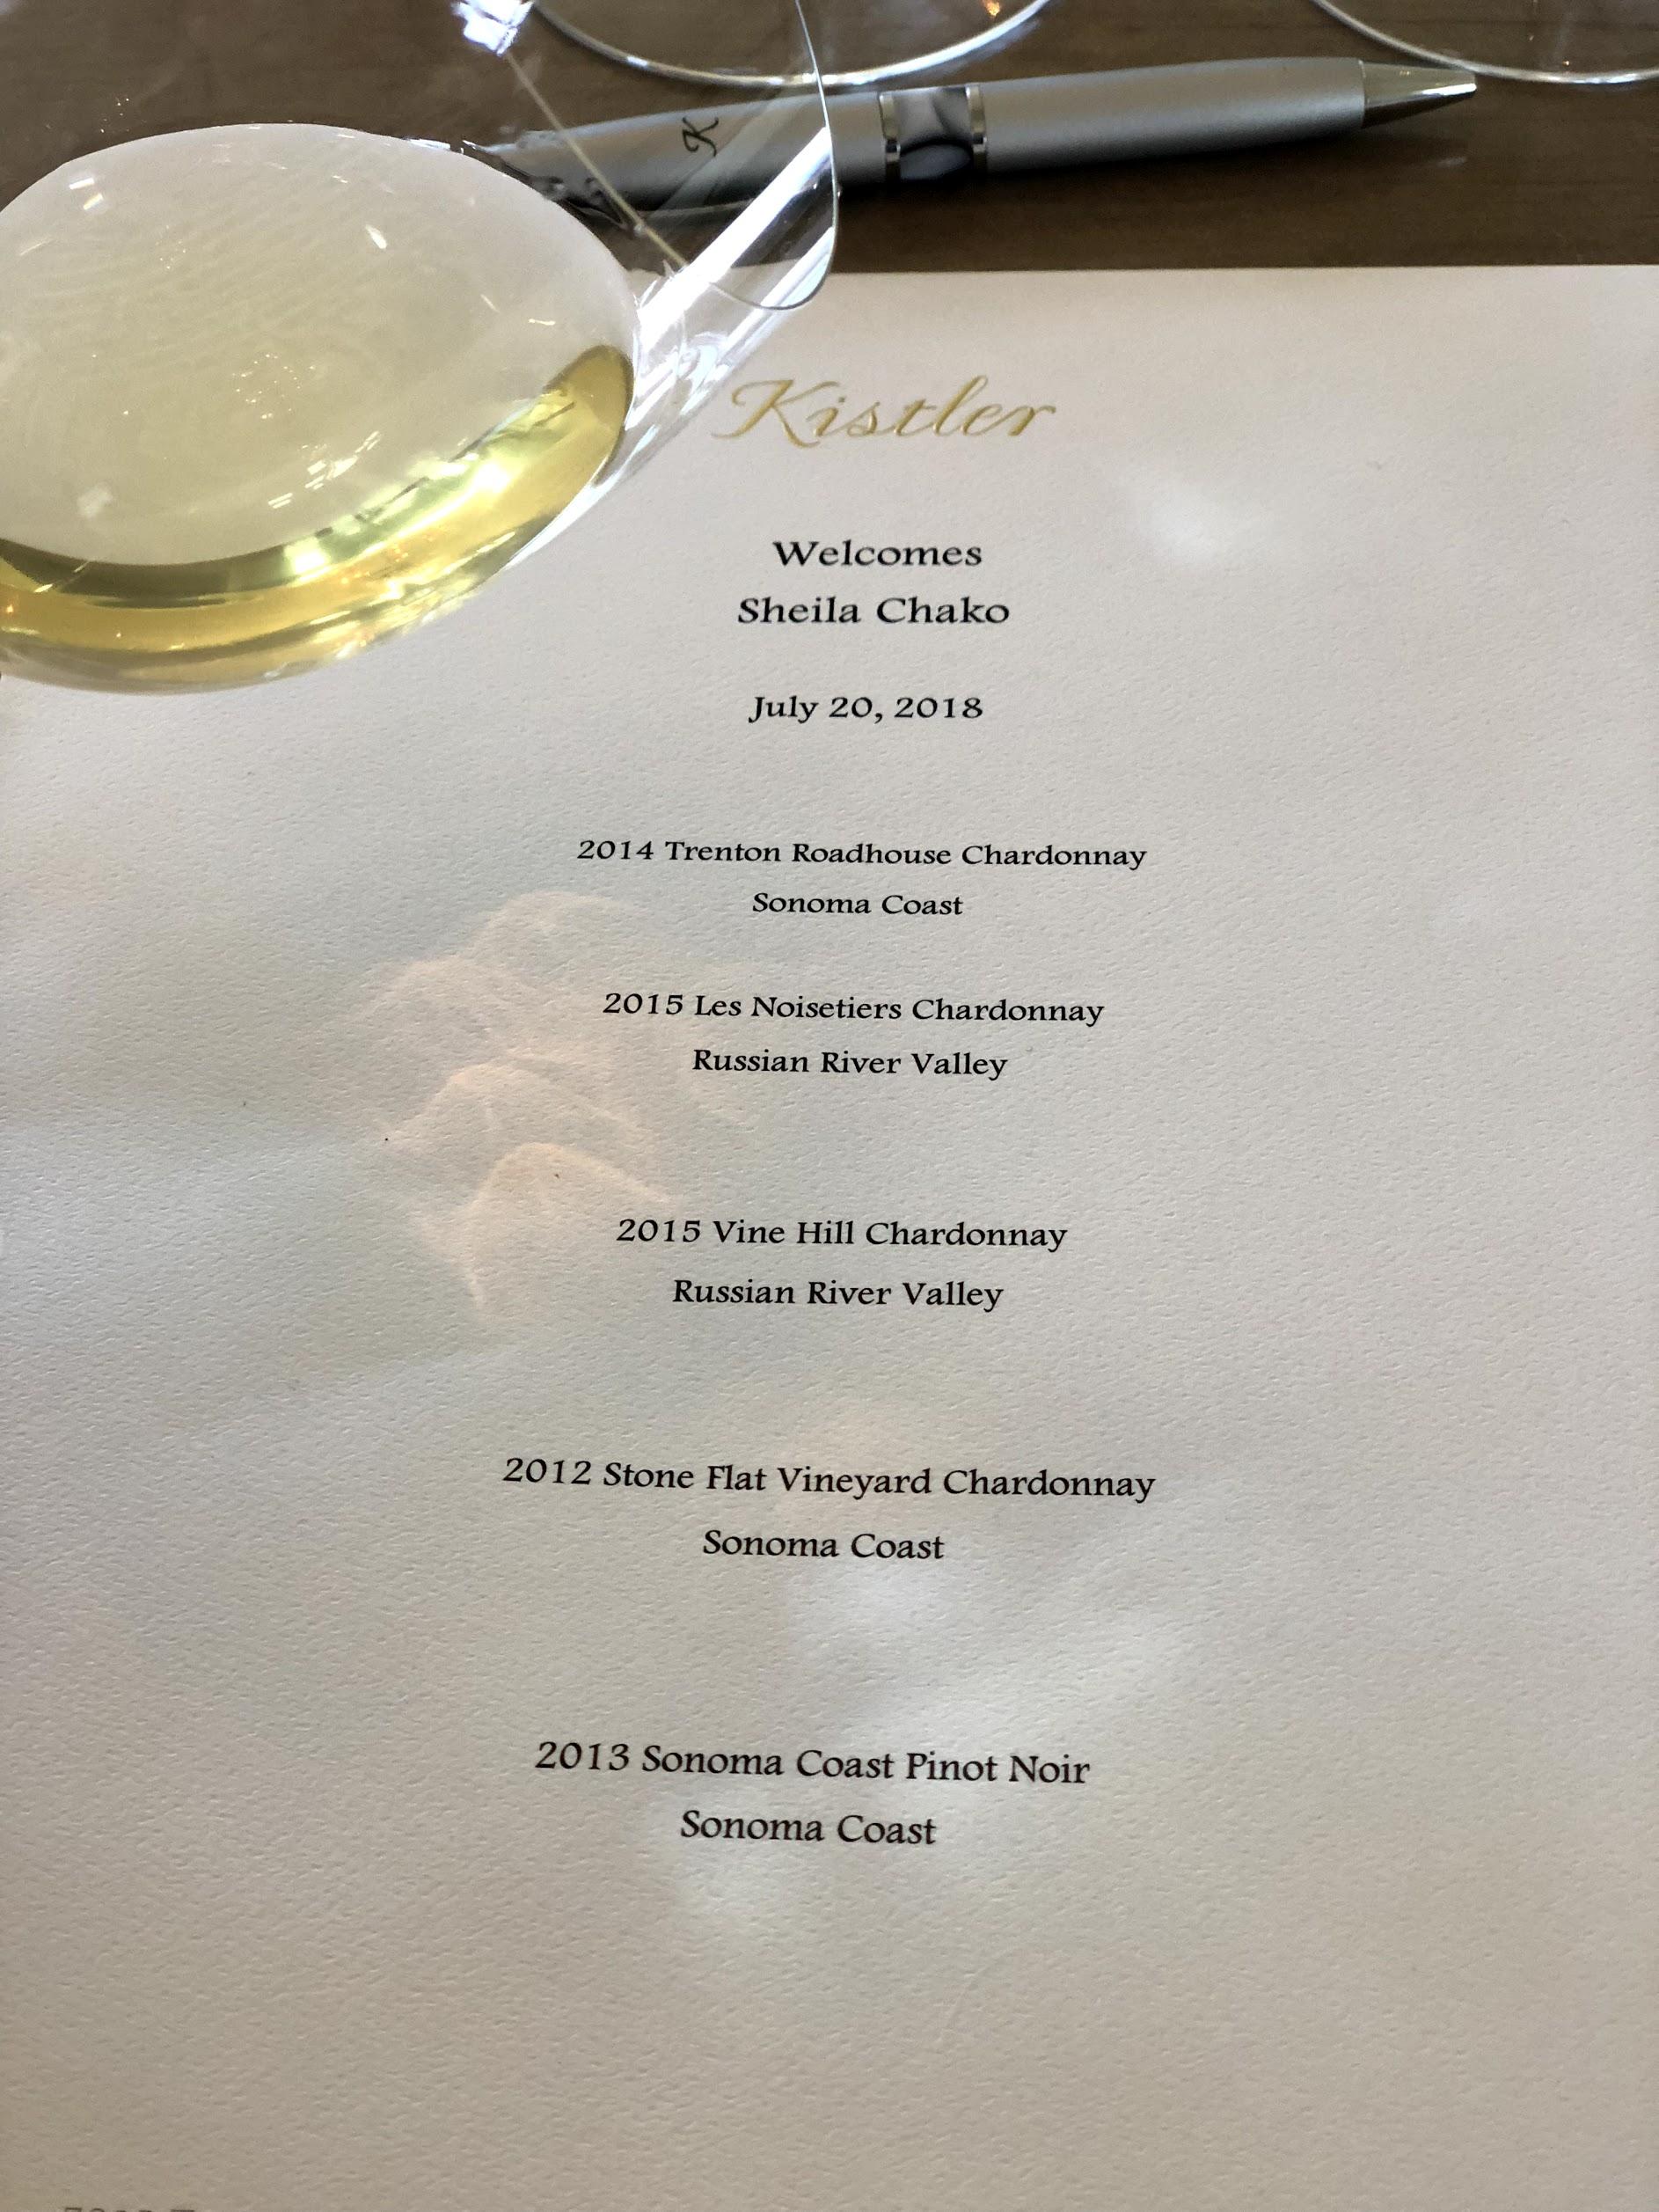 Sonoma Wine Life And Vista Grape Kathy At Kistler